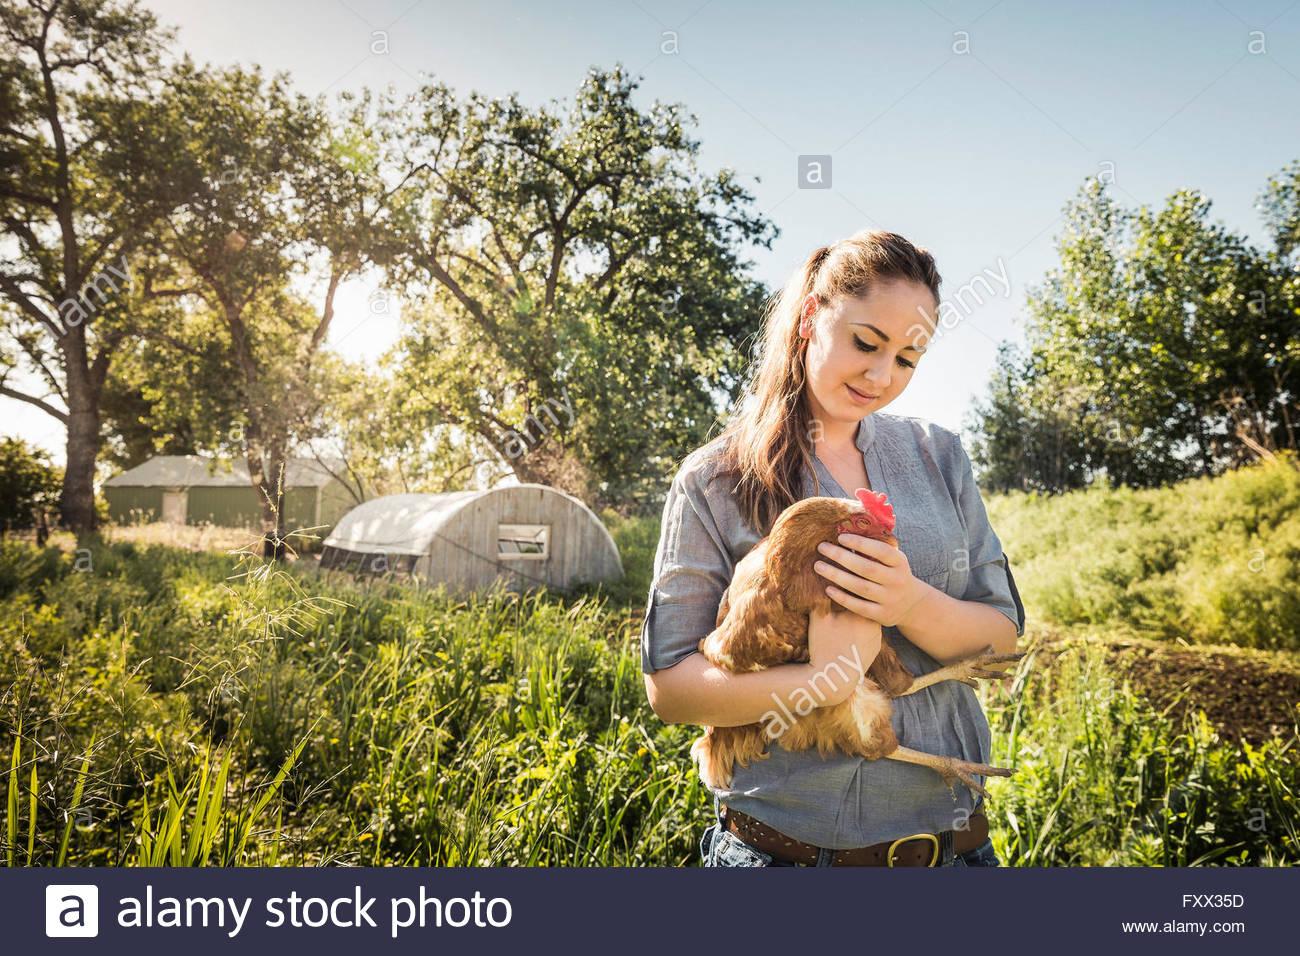 Frau mit Huhn auf Ackerland lächelnd Stockbild